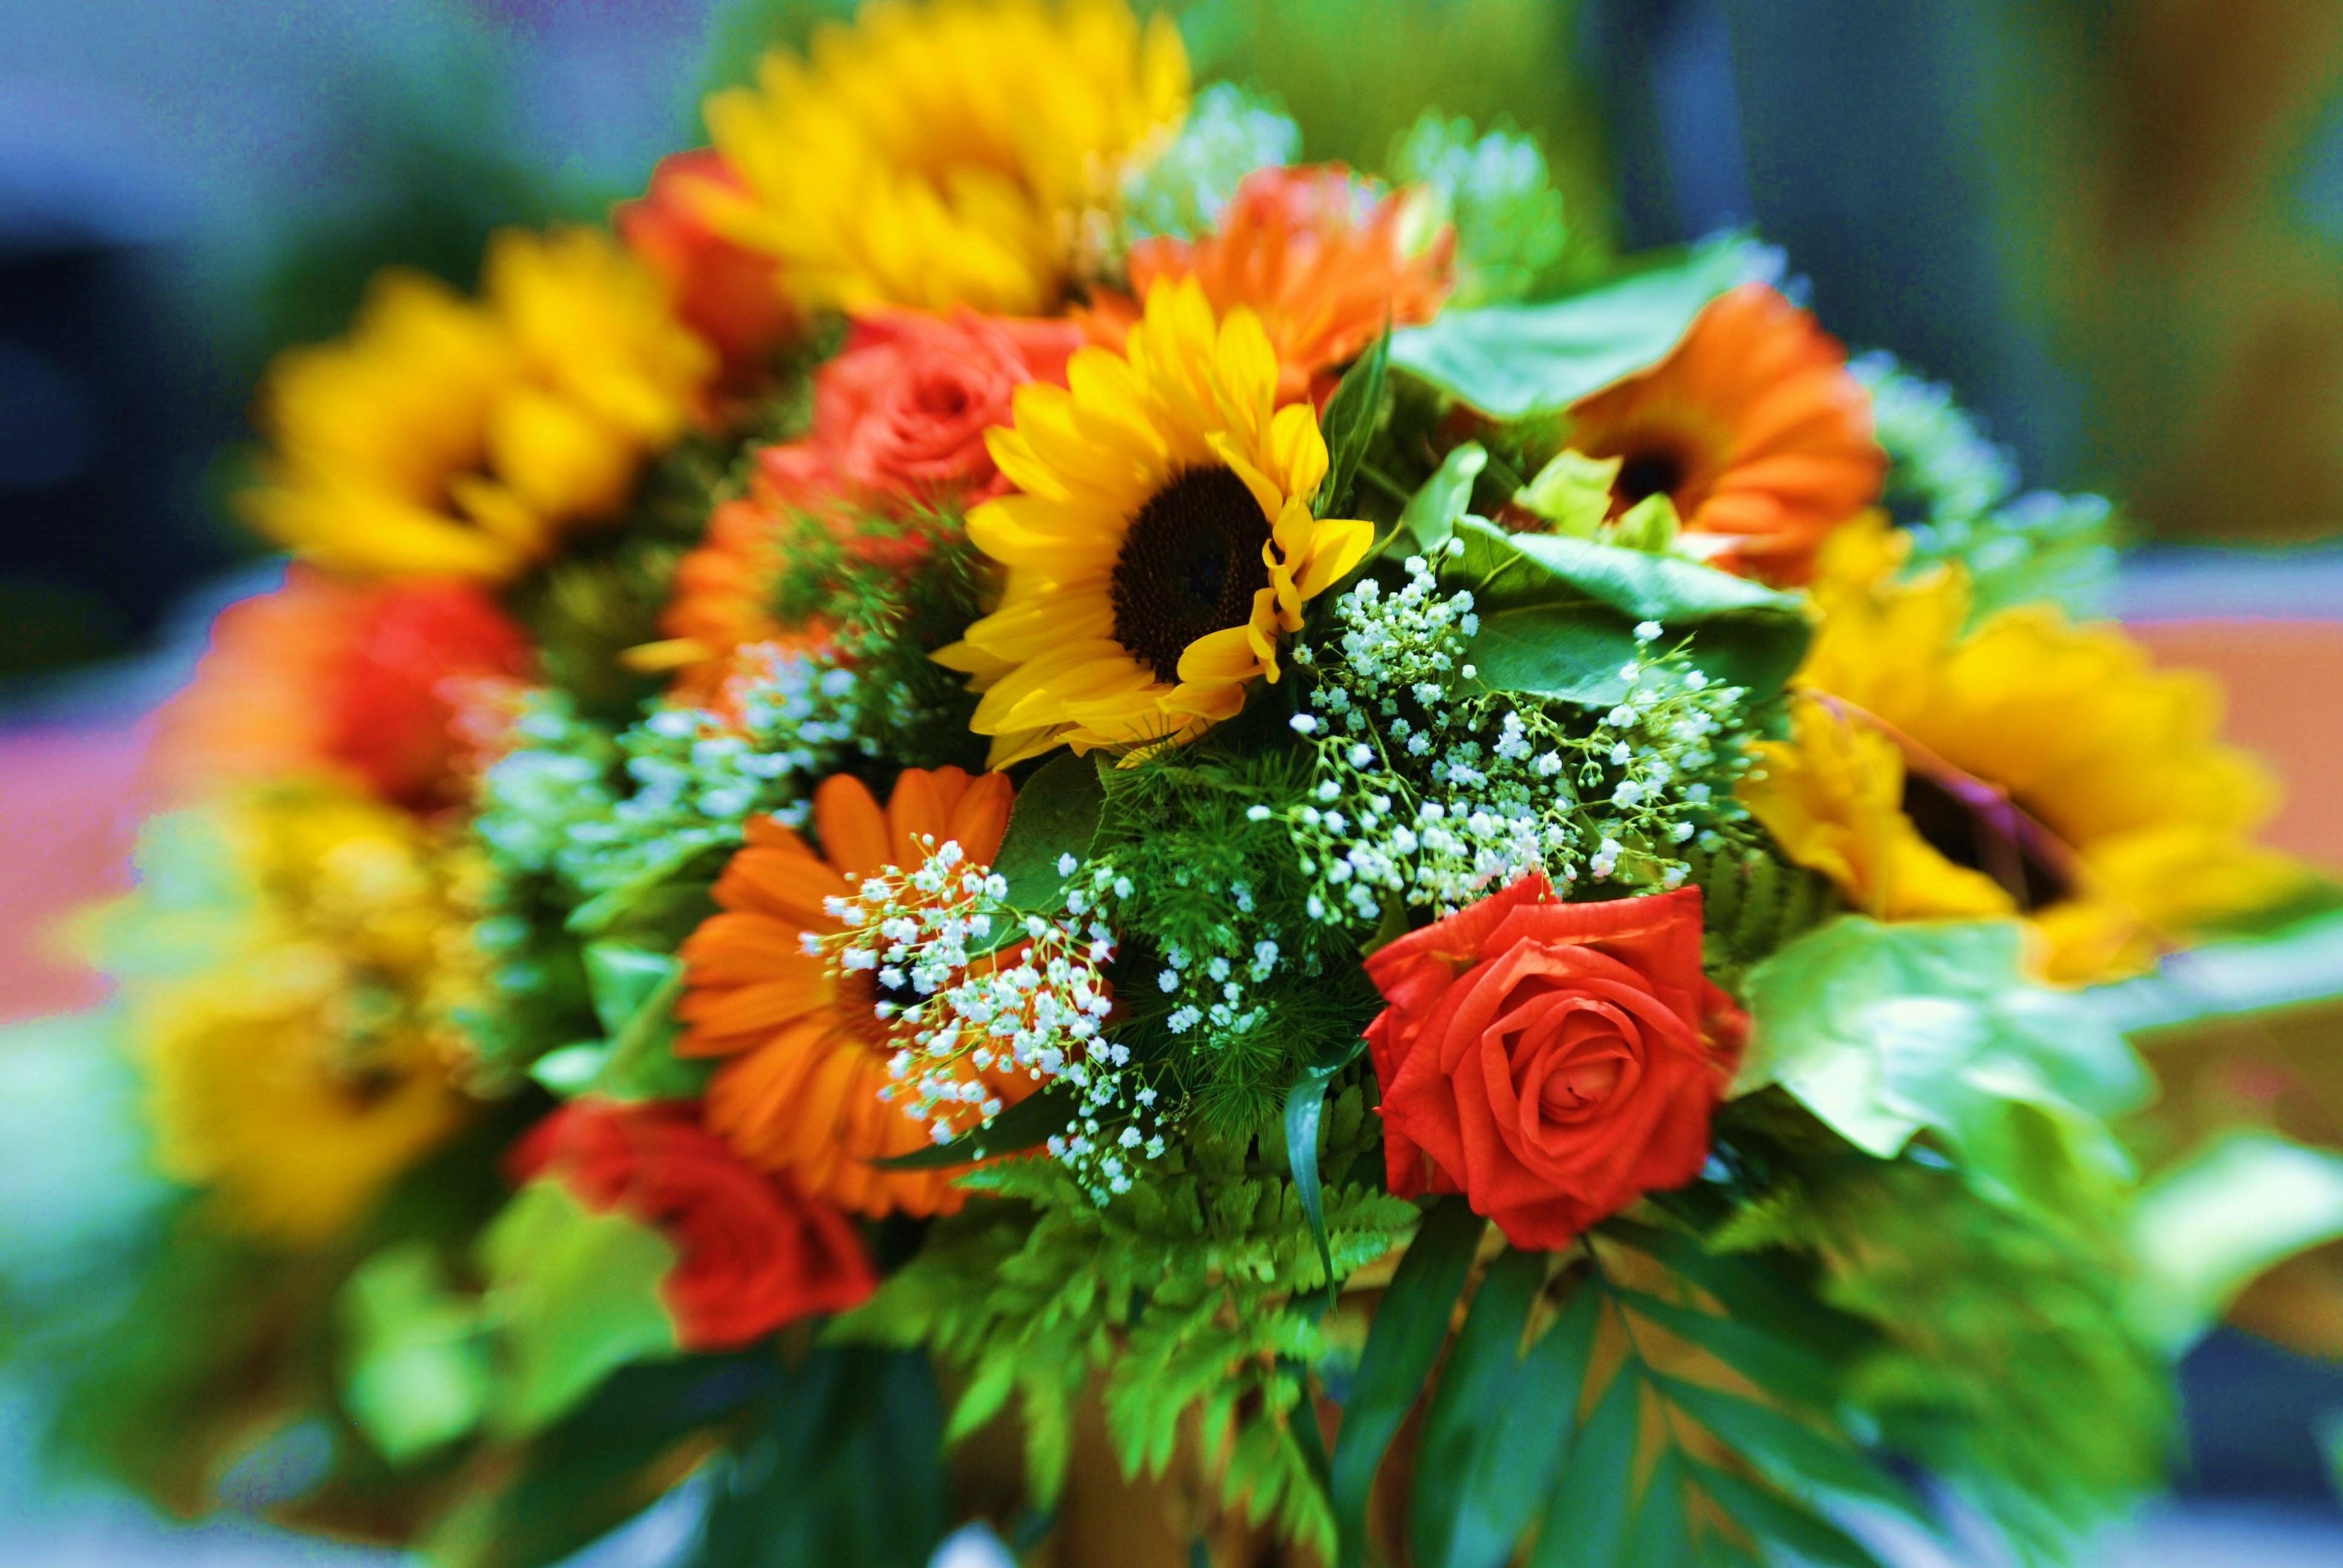 Fiori Matrimonio Girasoli : Bouquet da sposa con i girasoli foto matrimonio pourfemme